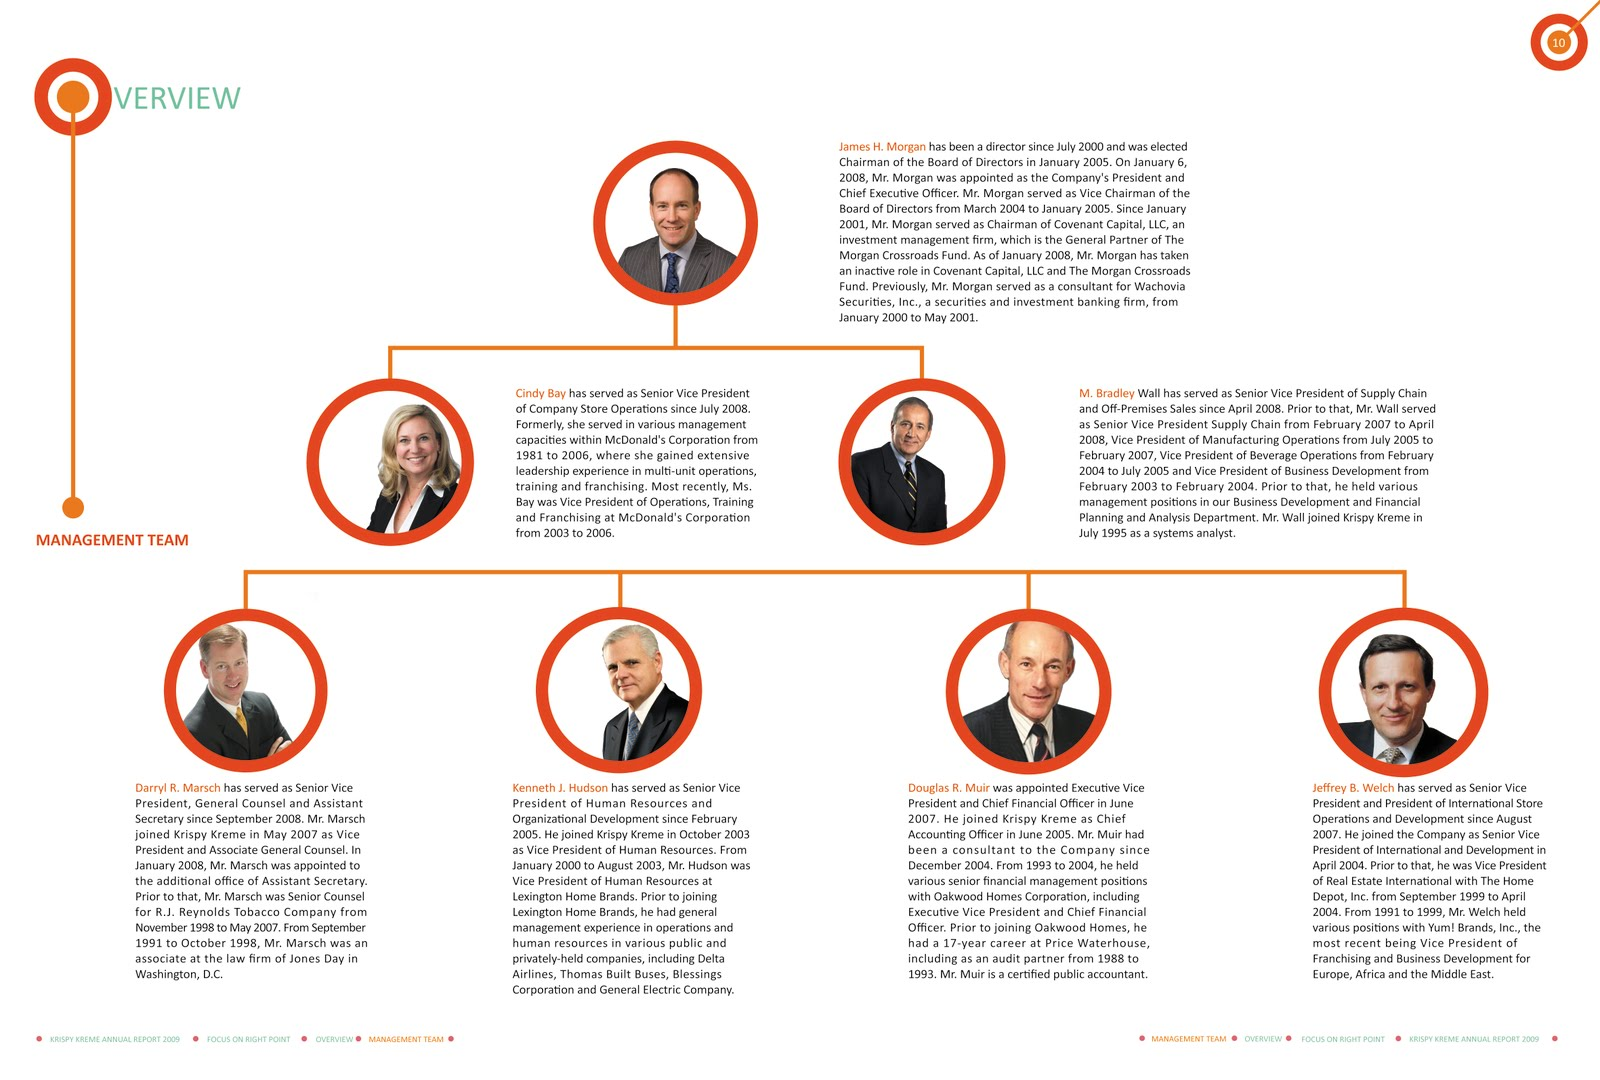 krispy kreme annual report